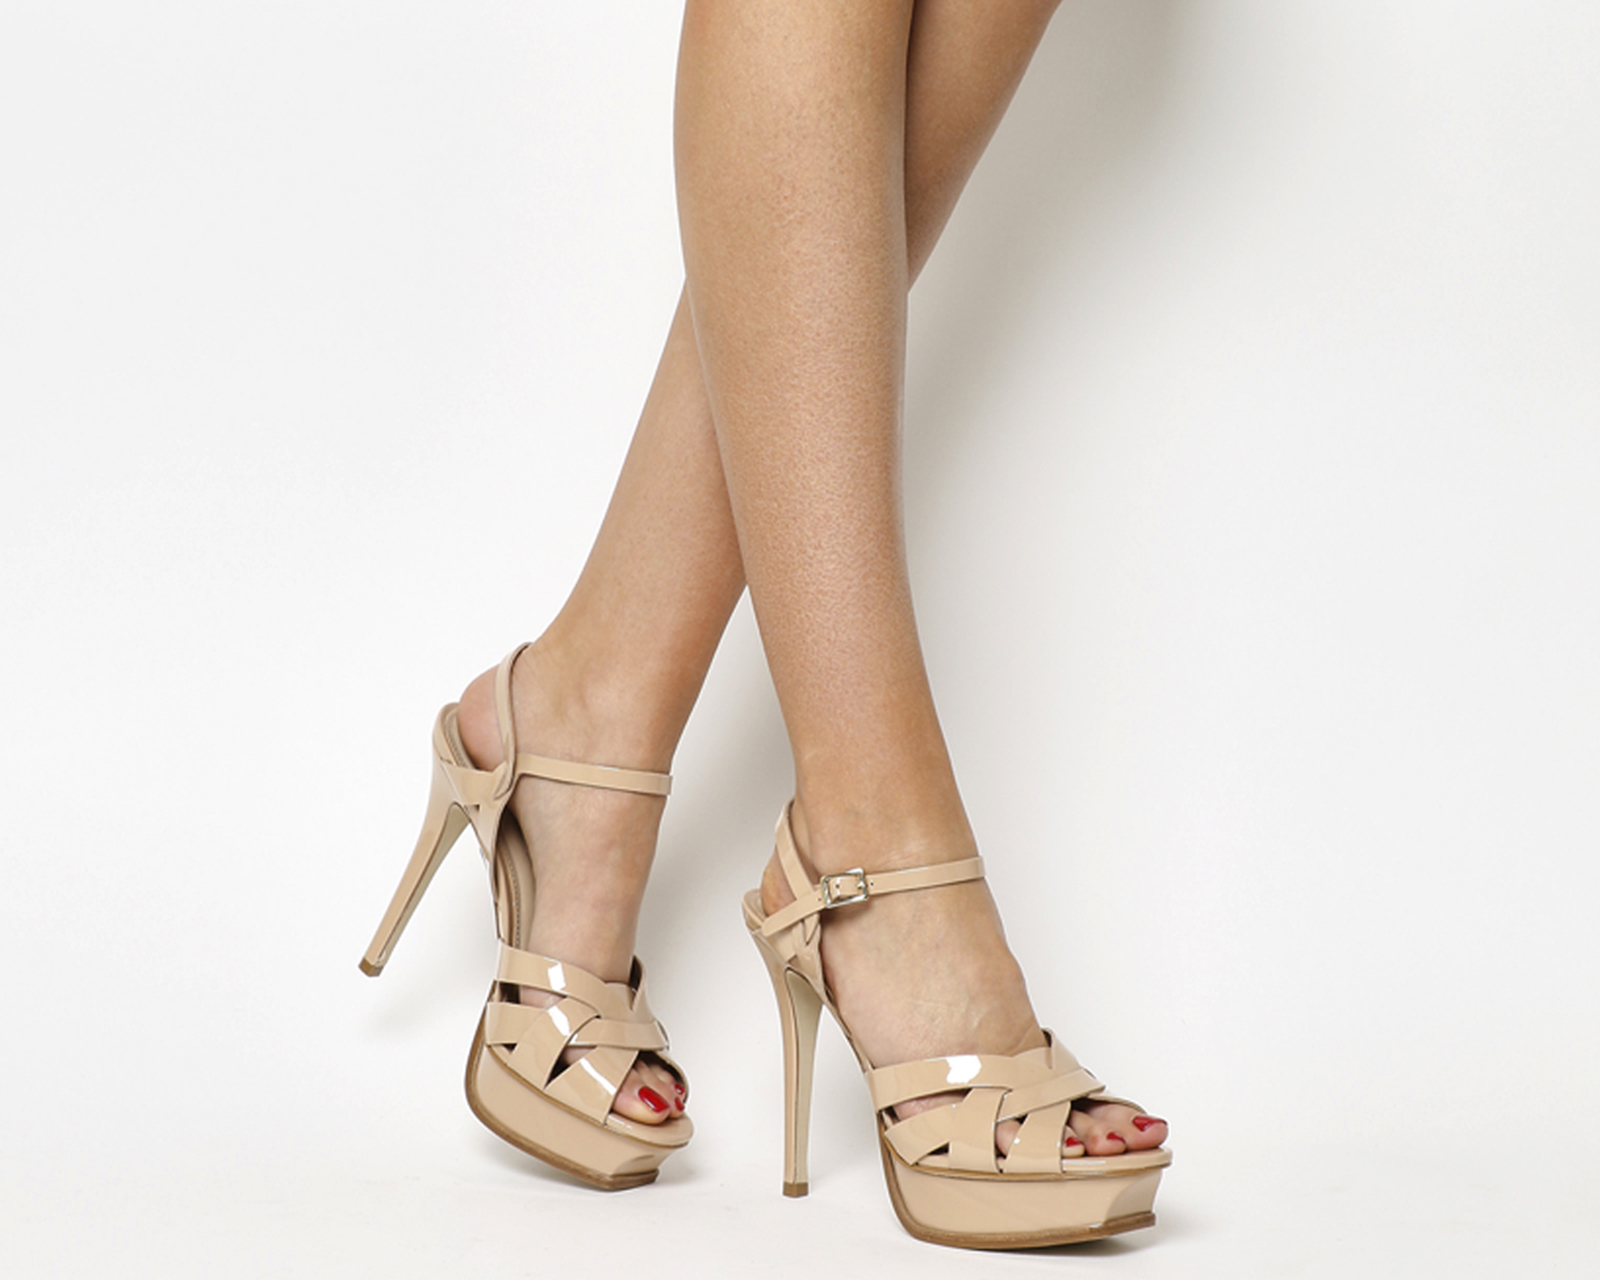 175e2d58390 Office Nostalgia Platform Heels Nude Patent Leather - High Heels